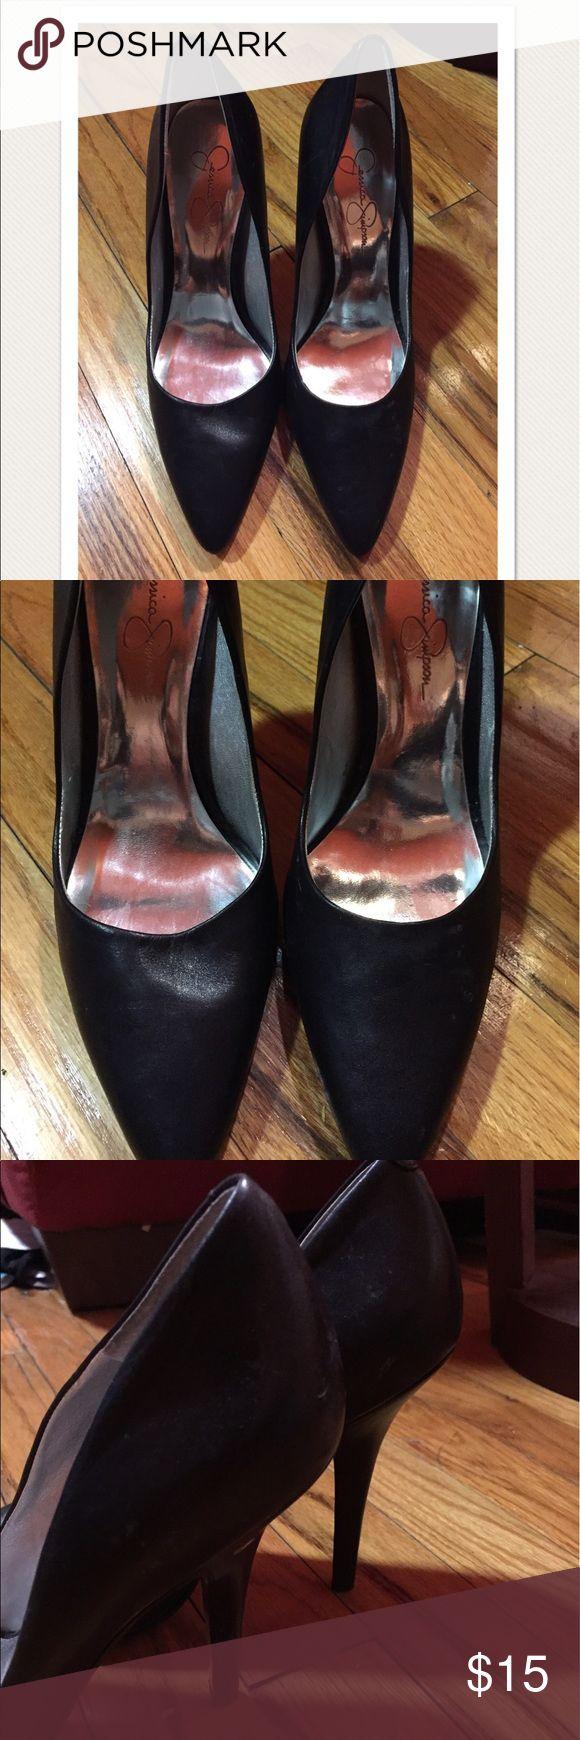 Jessica Simpson Black Pumps Jessica Simpson black leather pointy Pumps. Jessica Simpson Shoes Heels